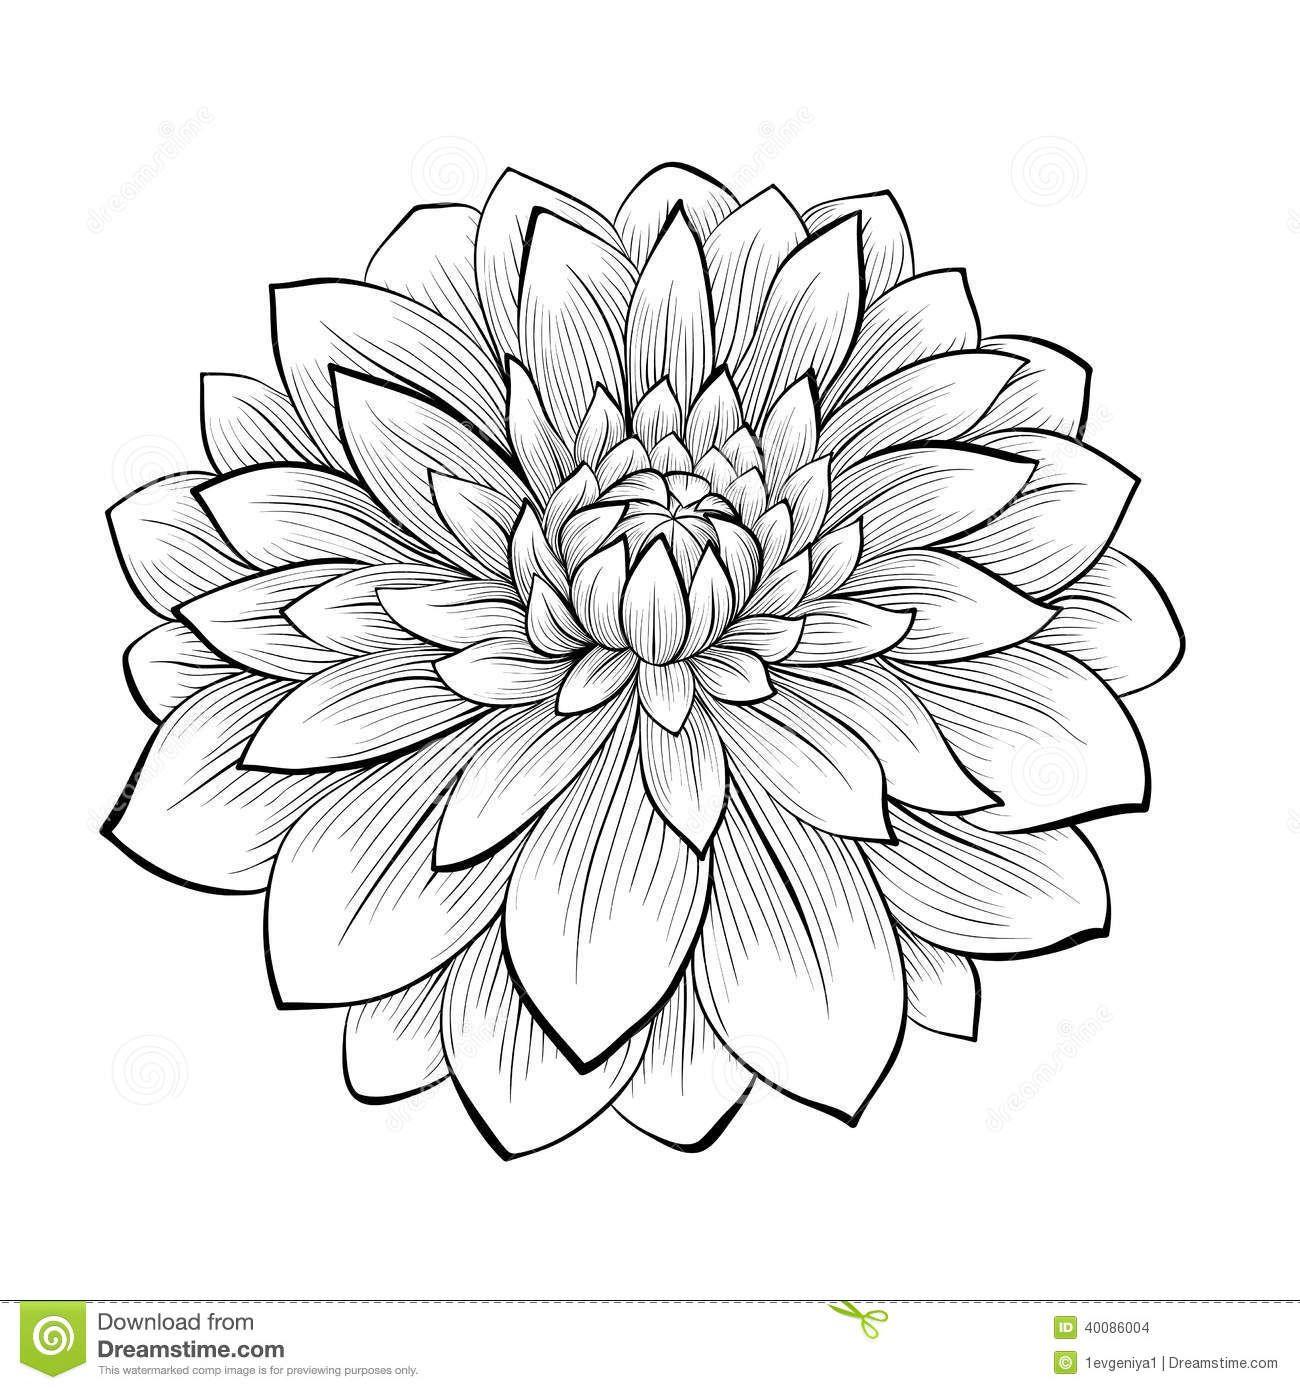 Beautiful Monochrome Black And White Dahlia Flower Isolated On Dahlia Flower Tattoos Flower Drawing Flower Tattoo